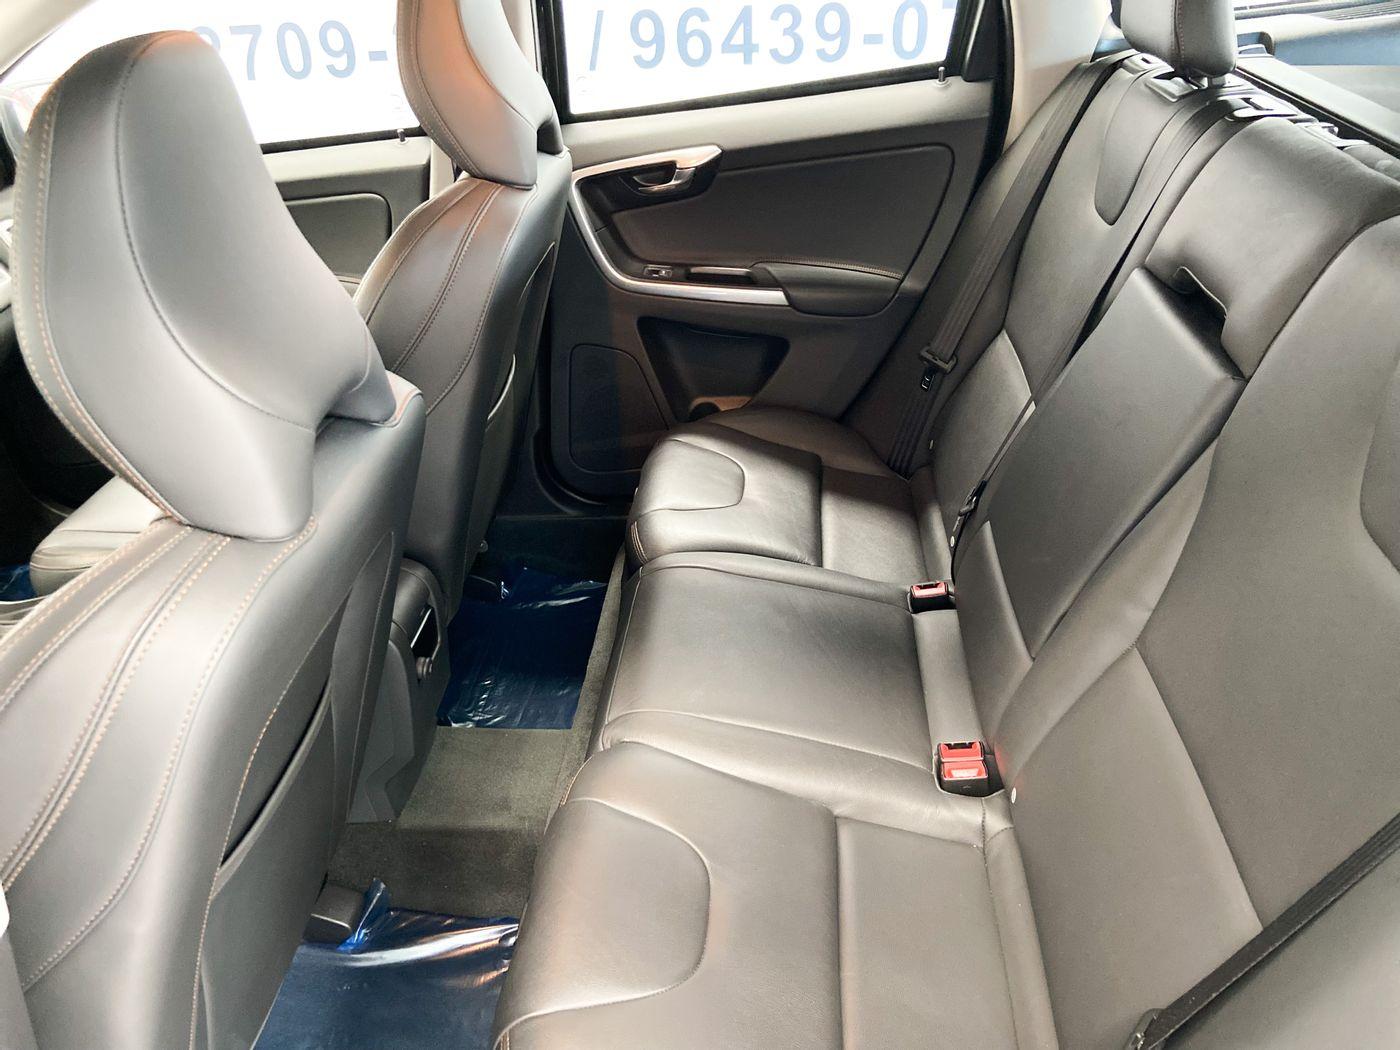 Volvo XC 60 T-5 MOMENTUM 2.0 245cv FWD 5p